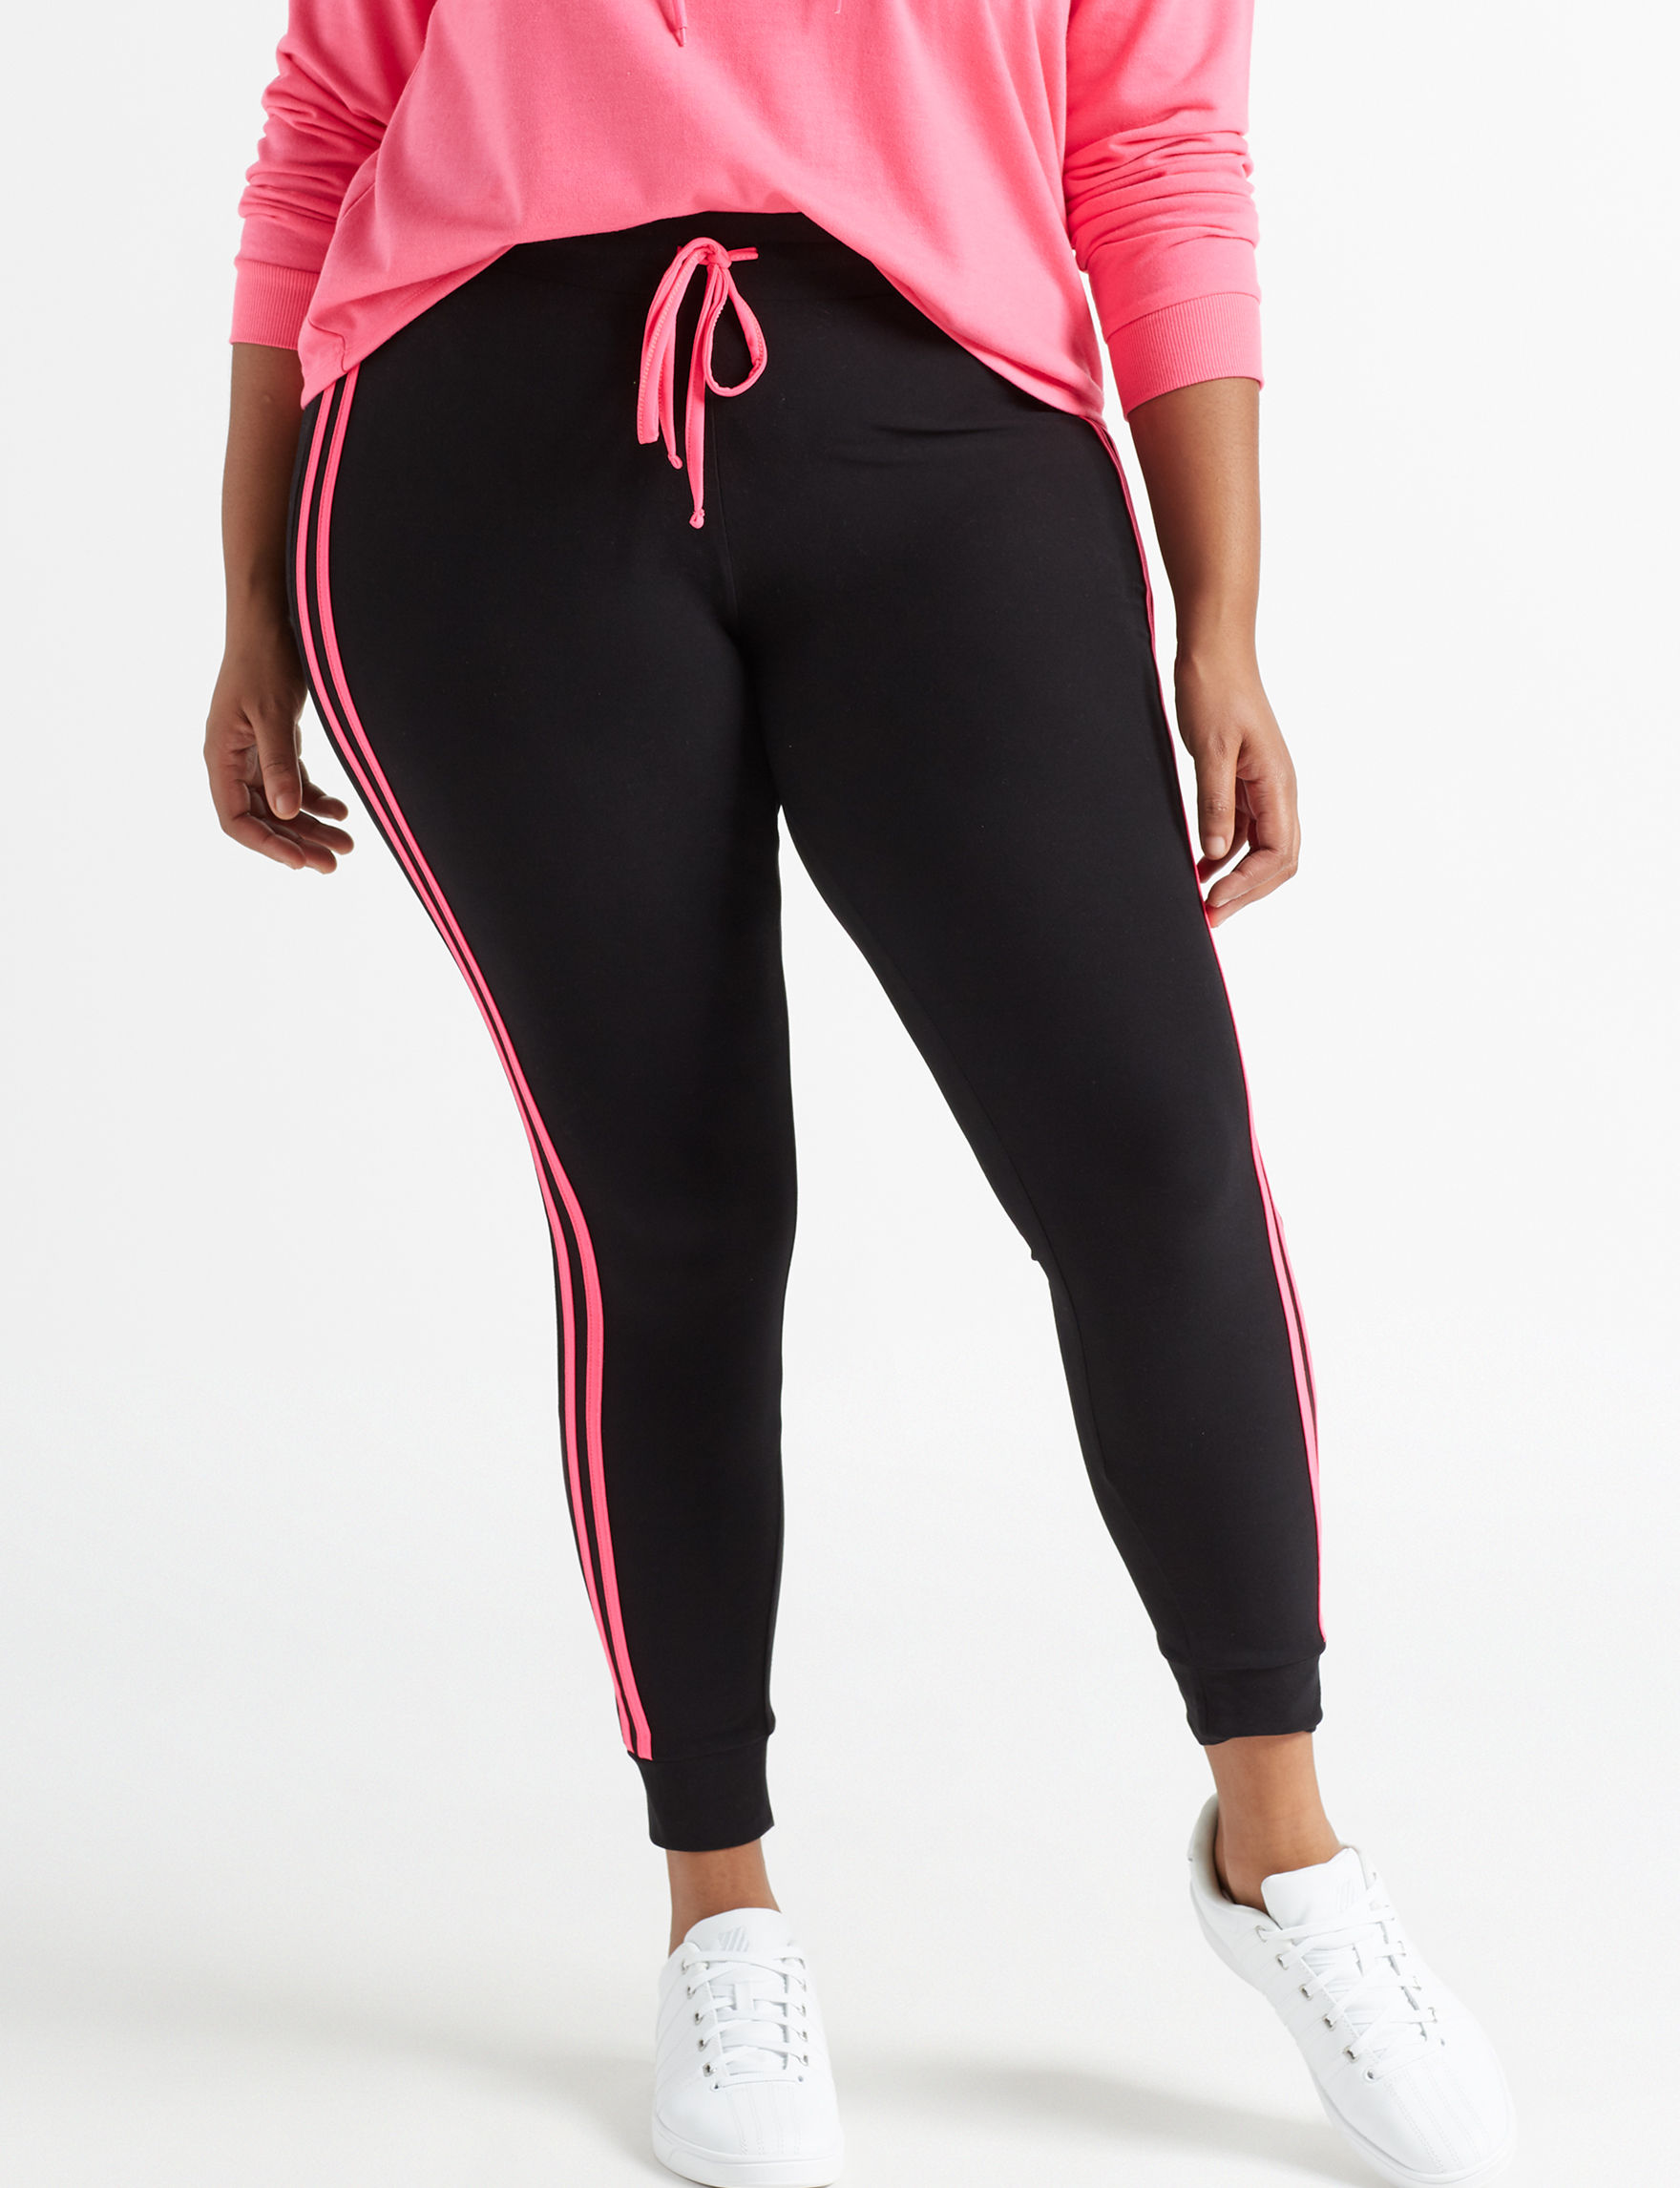 Ultra Flirt Black / Pink Soft Pants